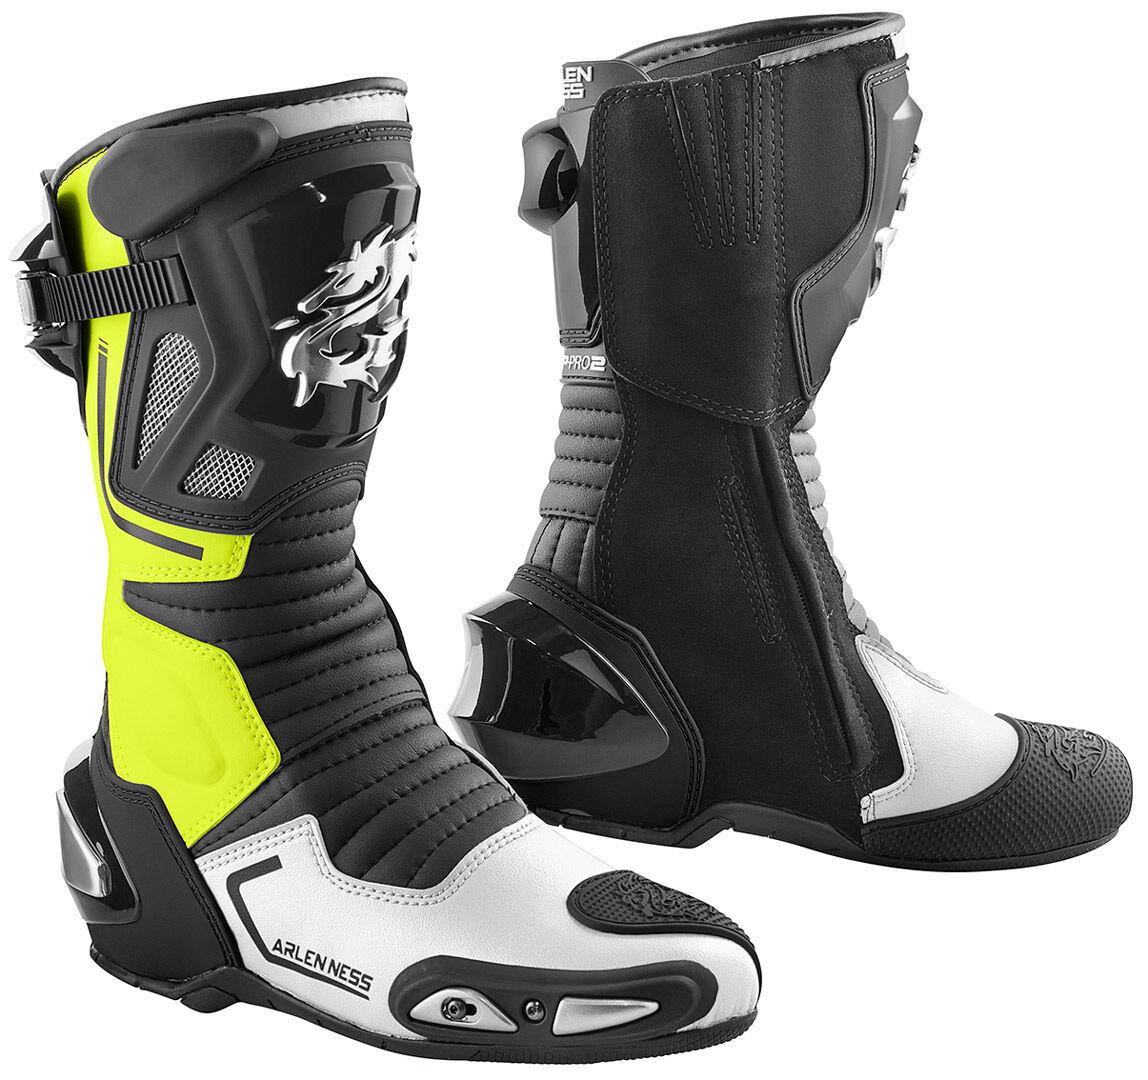 Arlen Ness Sugello Bottes de moto Noir Jaune taille : 40